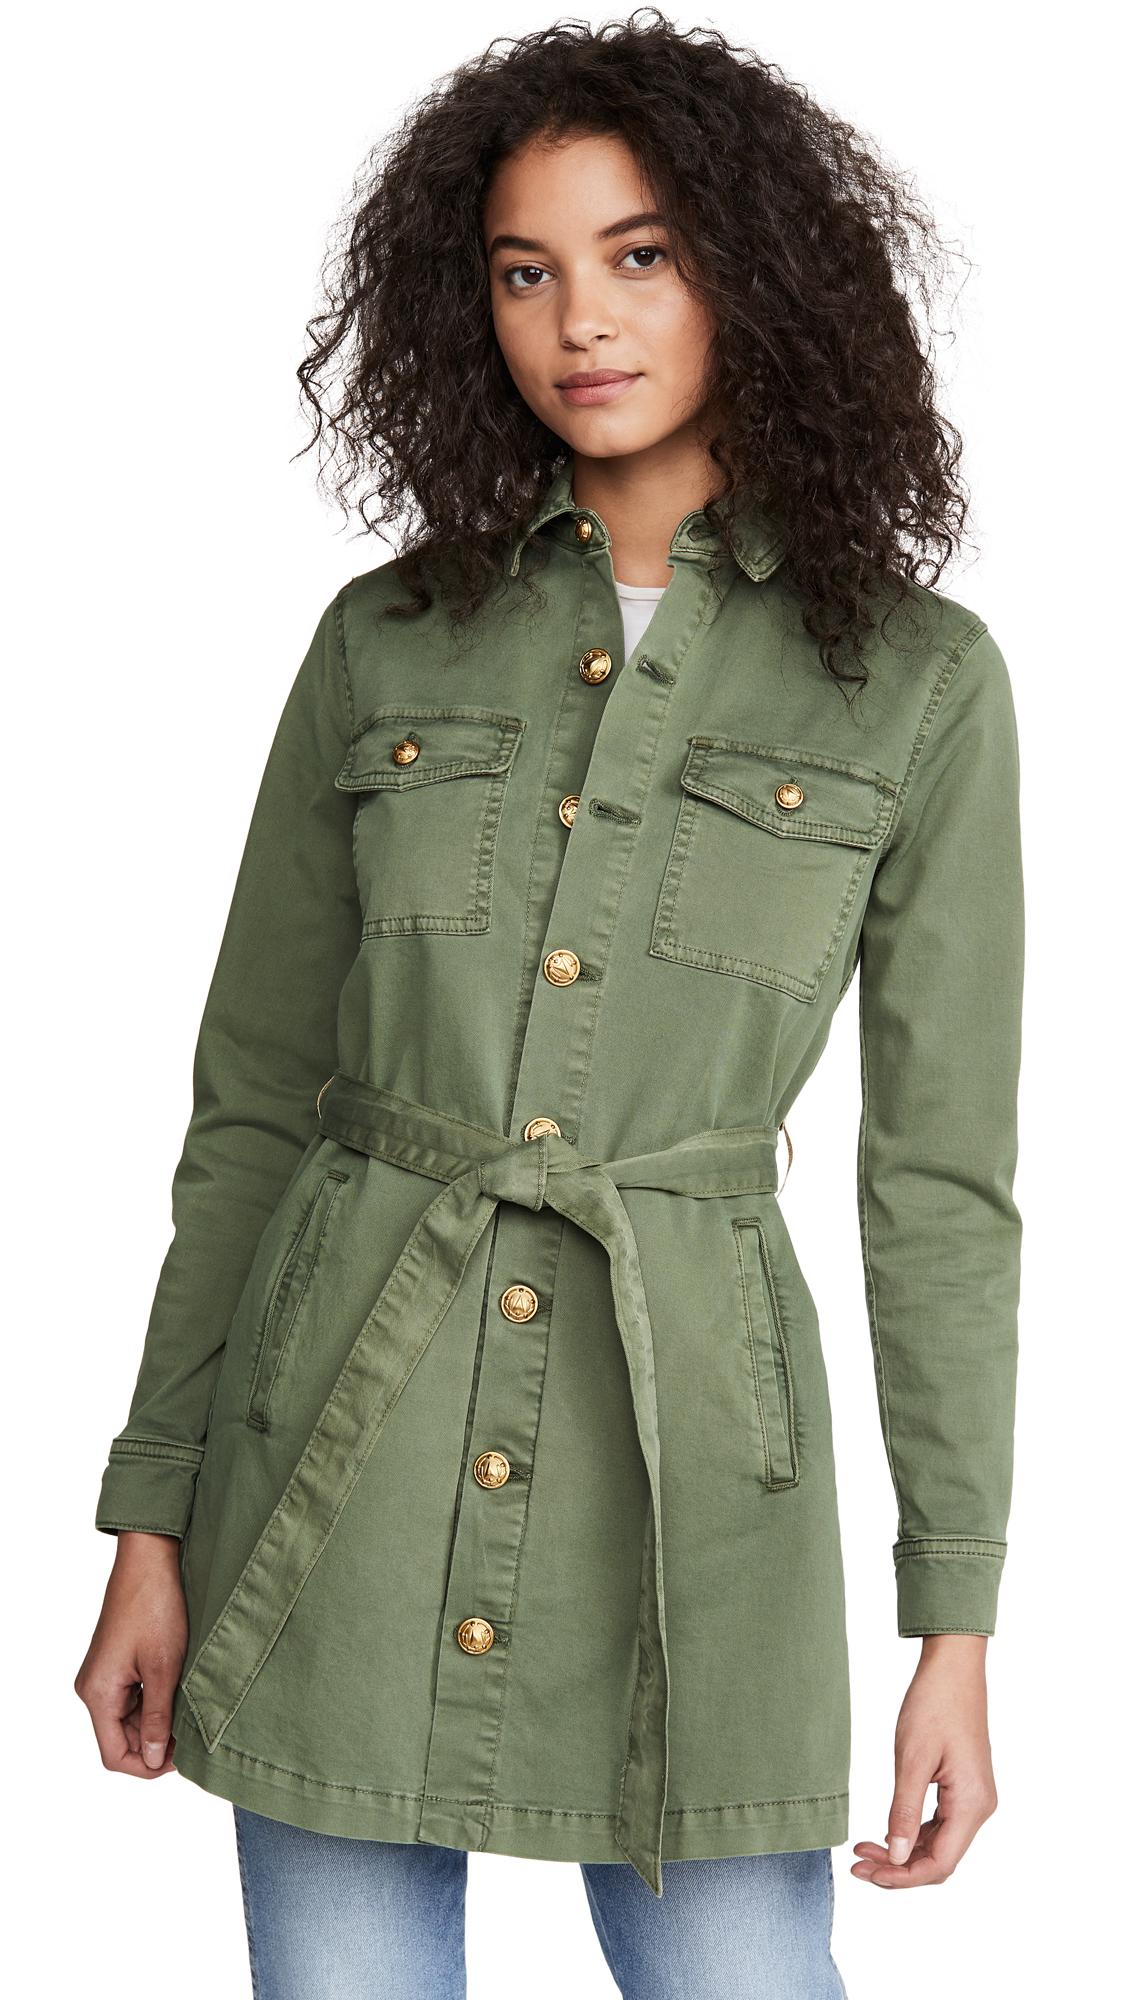 Buy L'AGENCE Samantha Safari Jacket online beautiful L'AGENCE Jackets, Coats, Coats